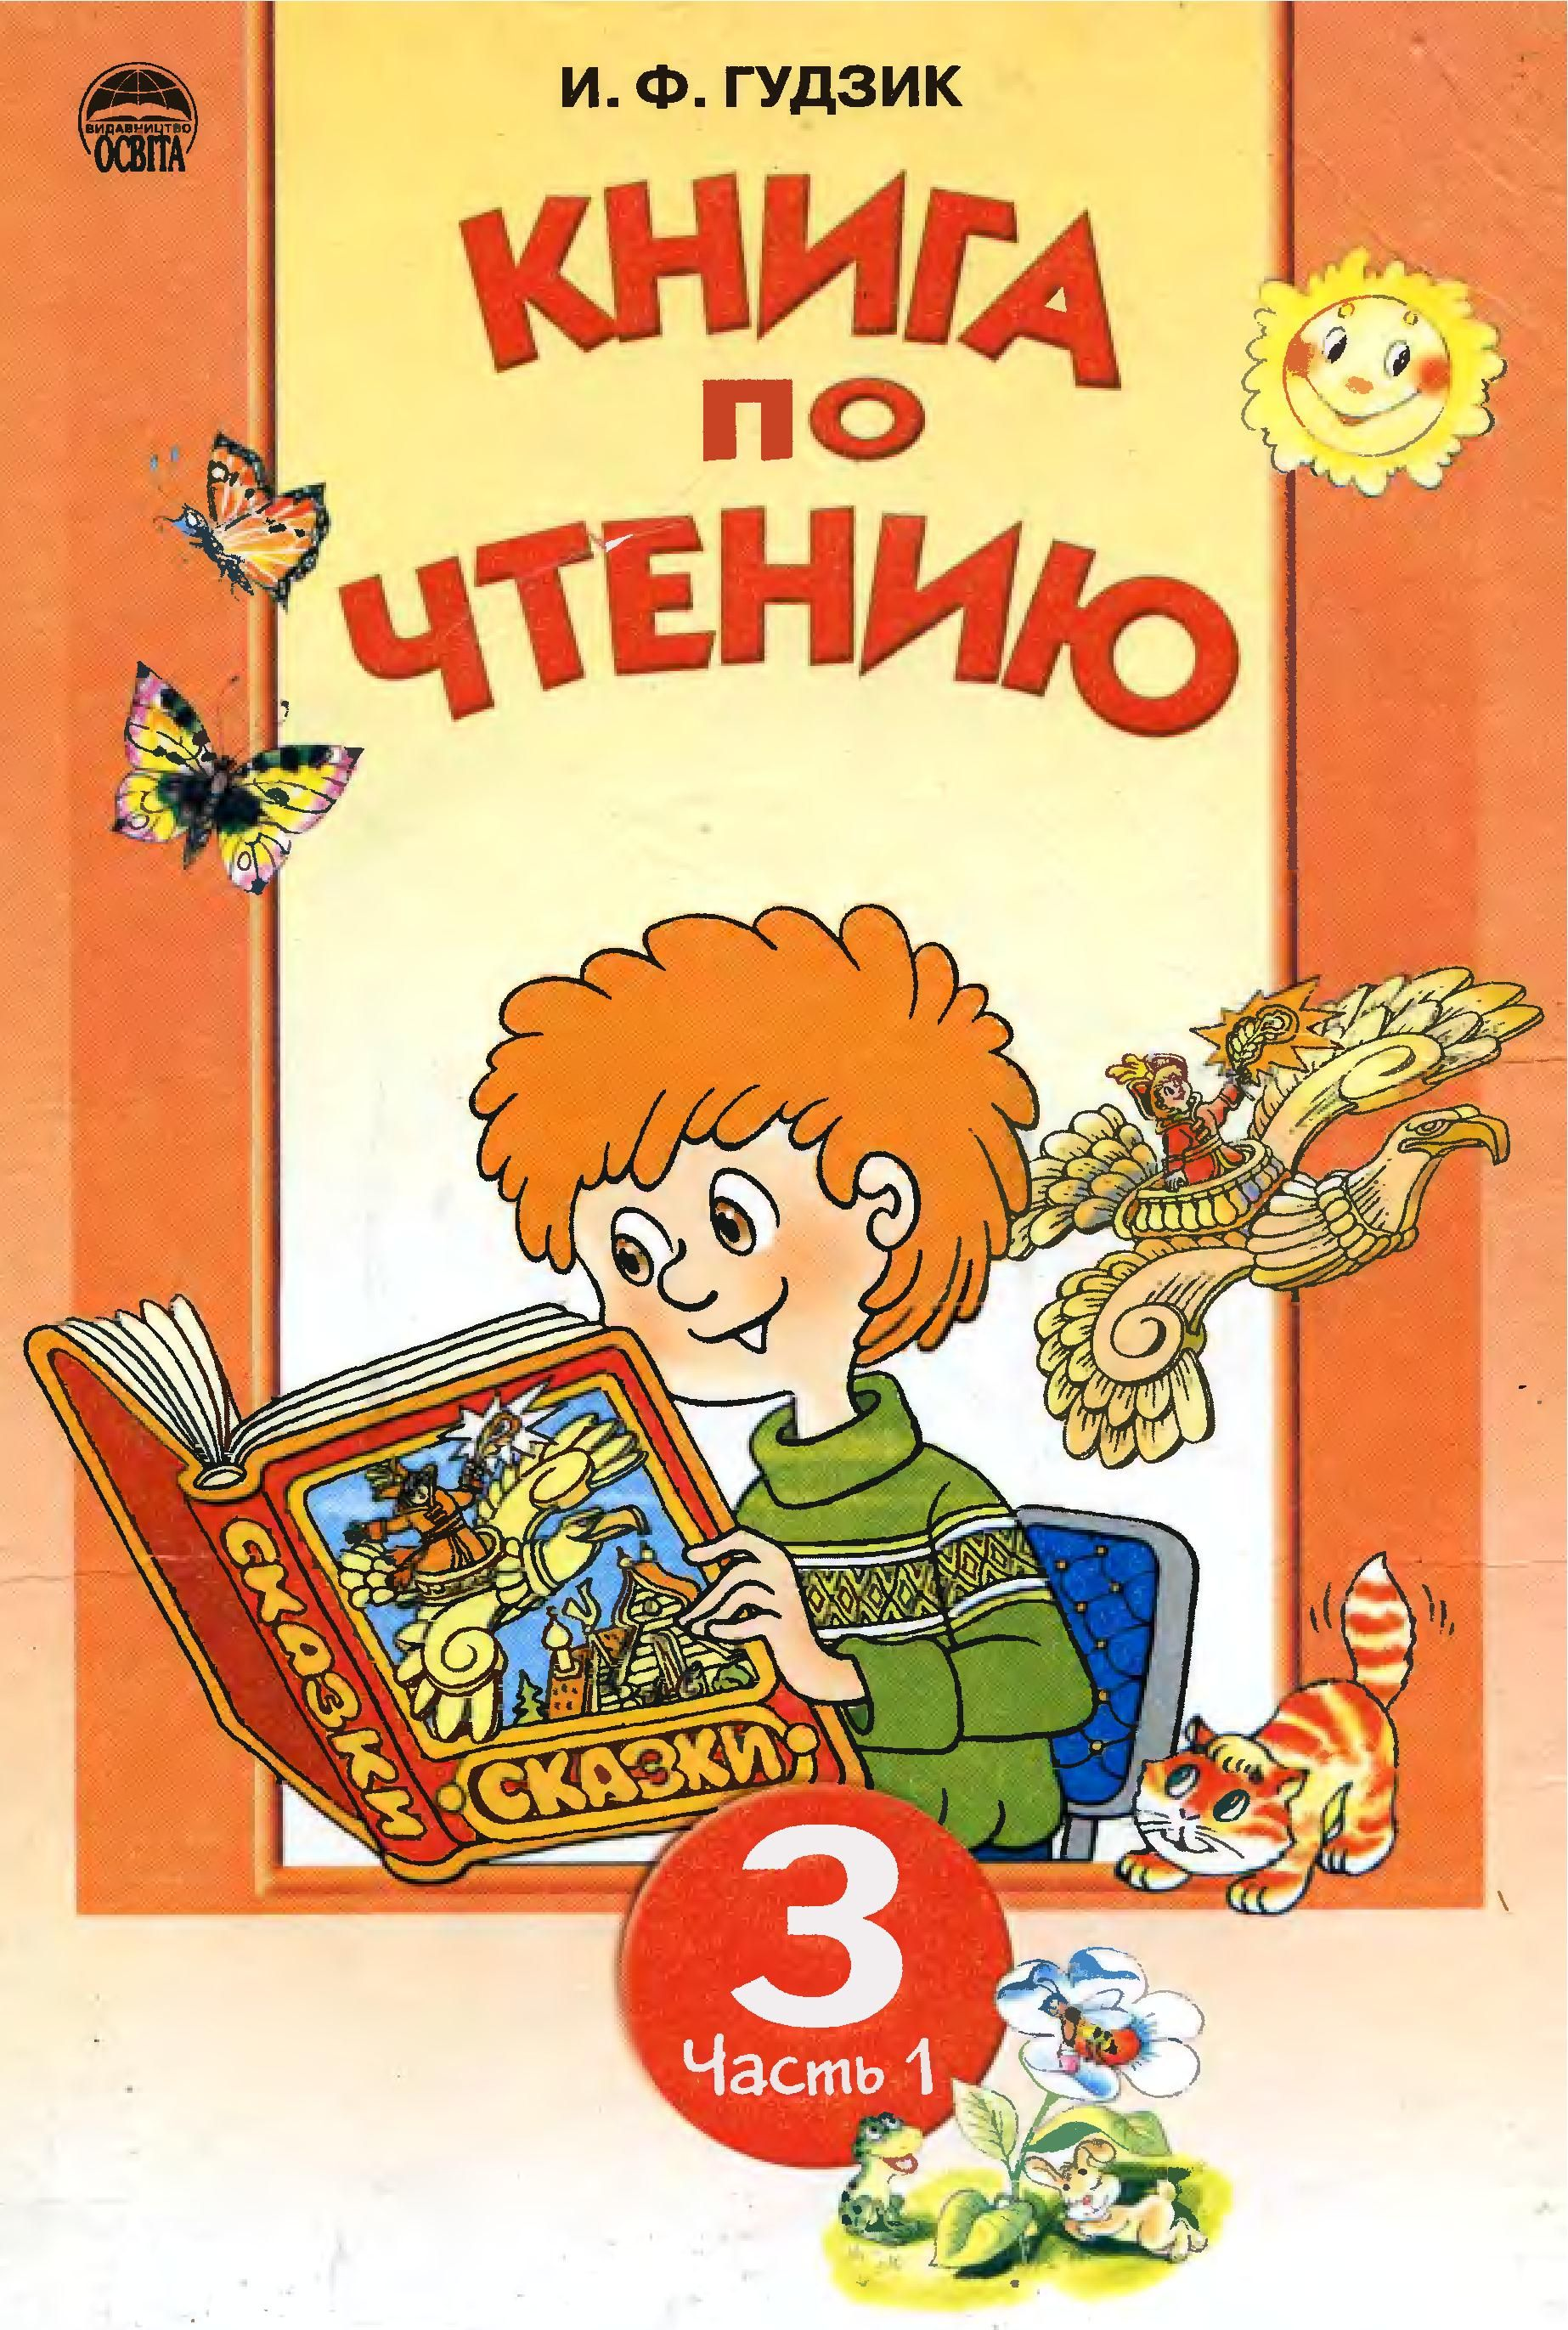 Книга по чтению 3 класс гудзик